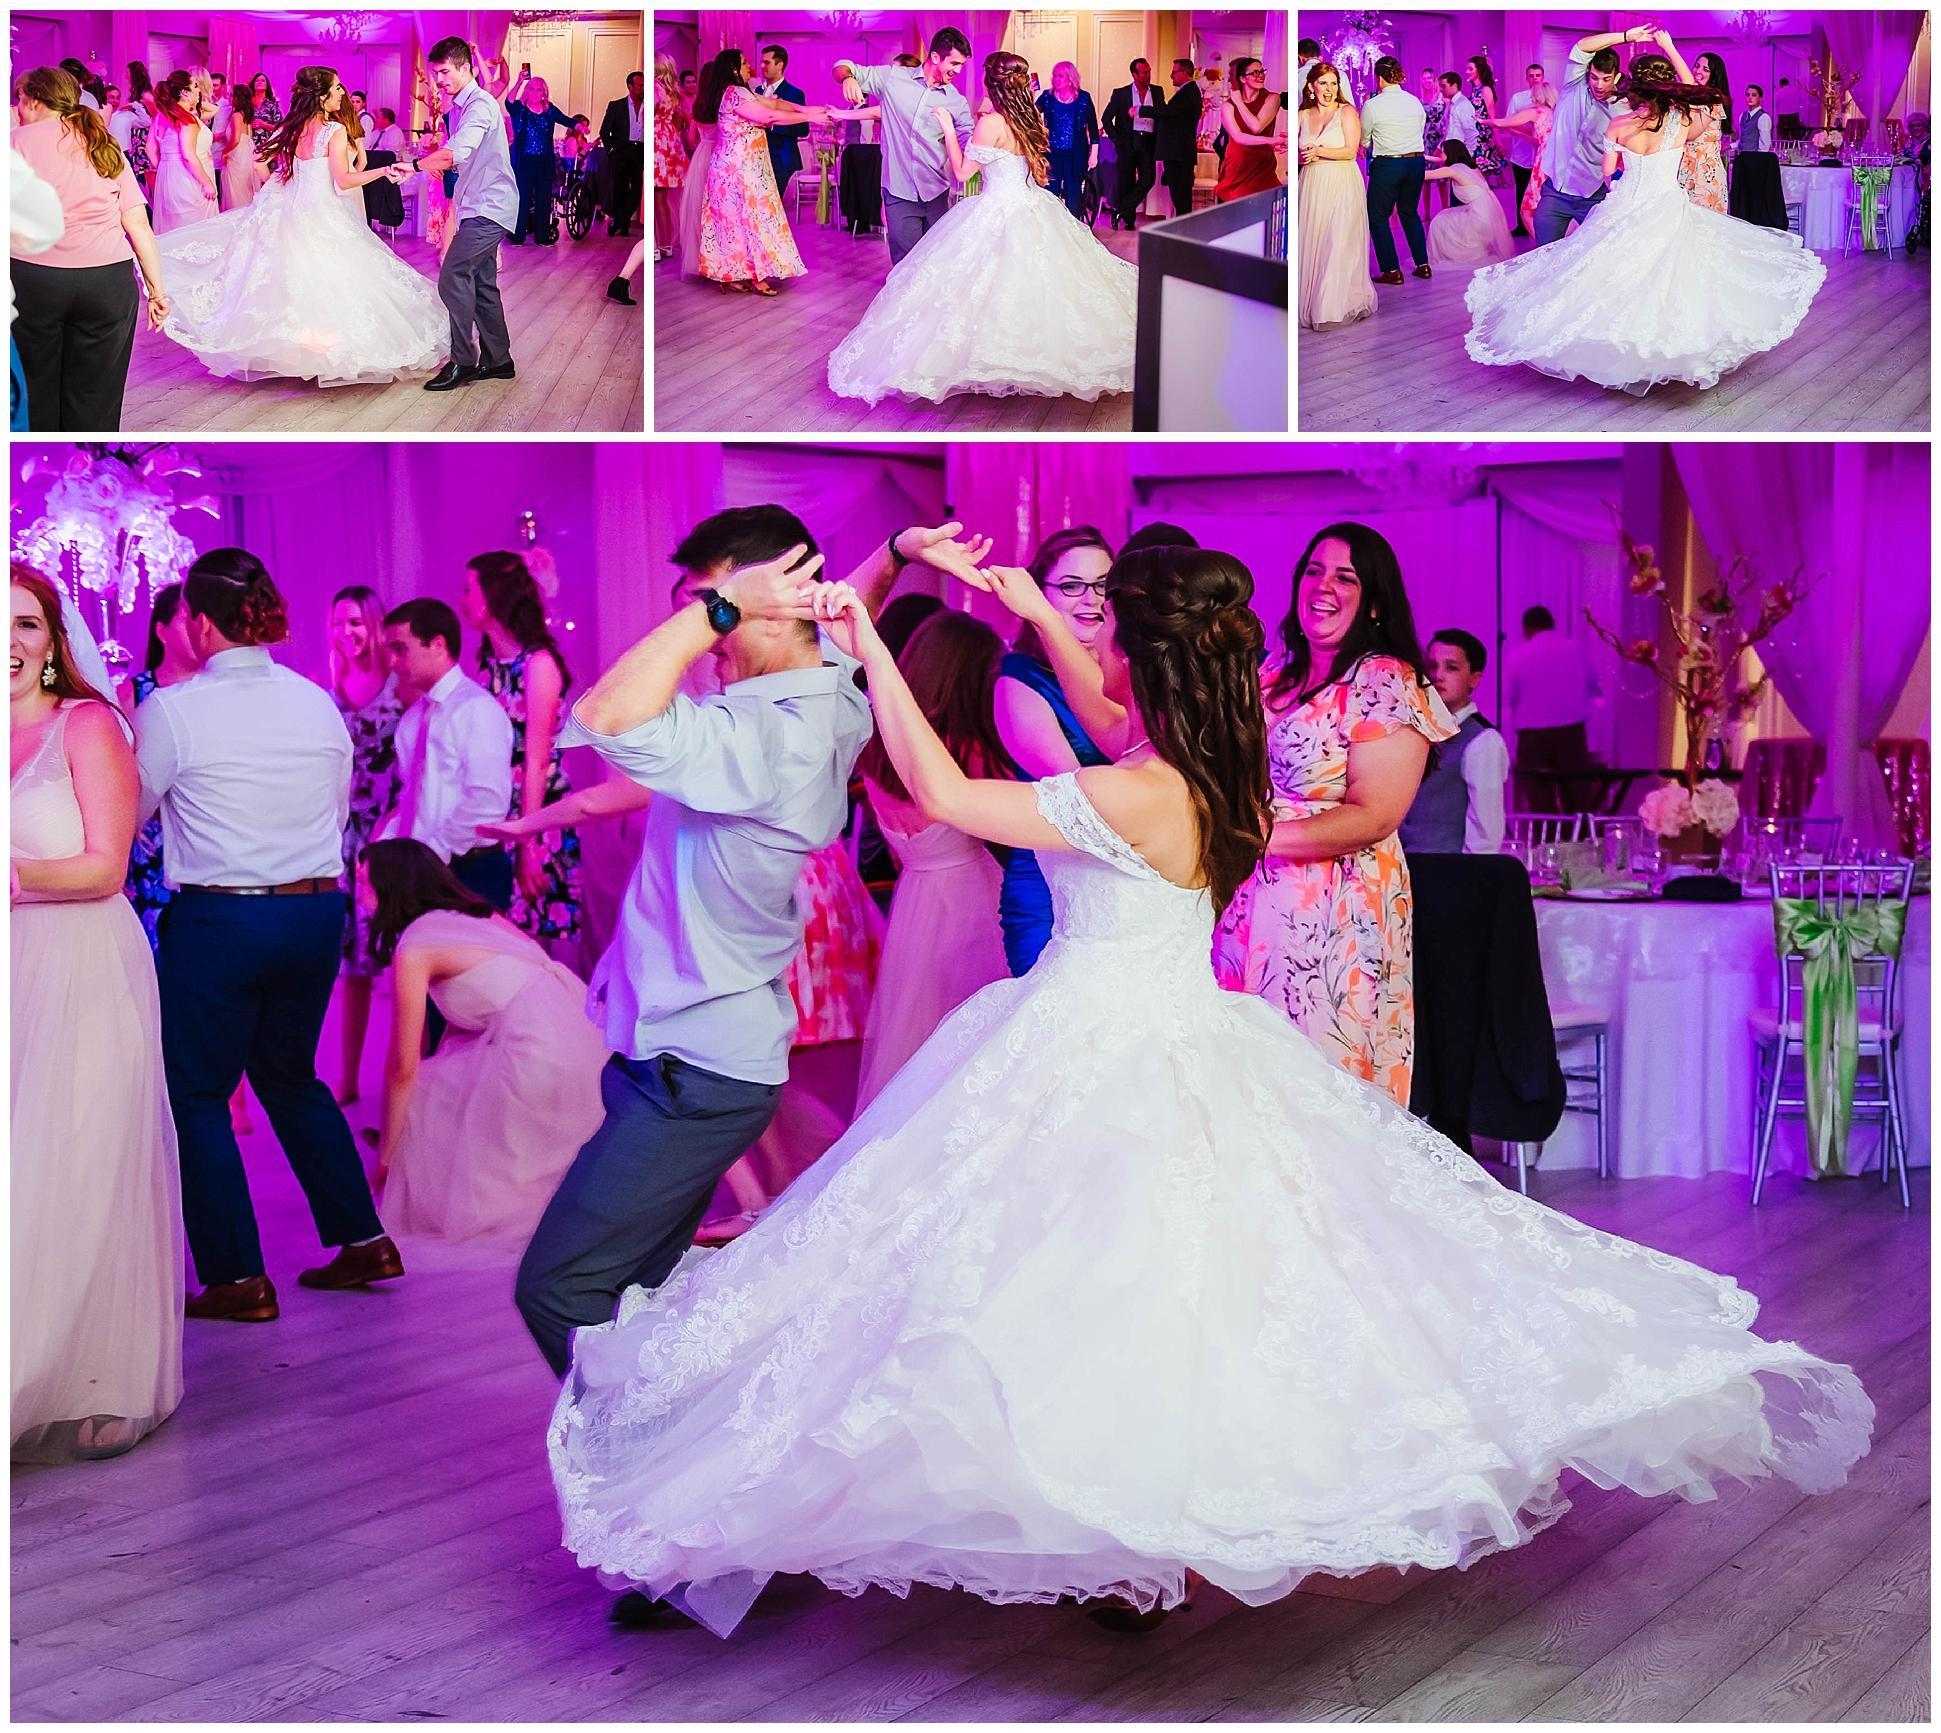 st-pete-wedding-photographer-sunken-gardens-crystal-ballroom-princess-dancer_0213.jpg